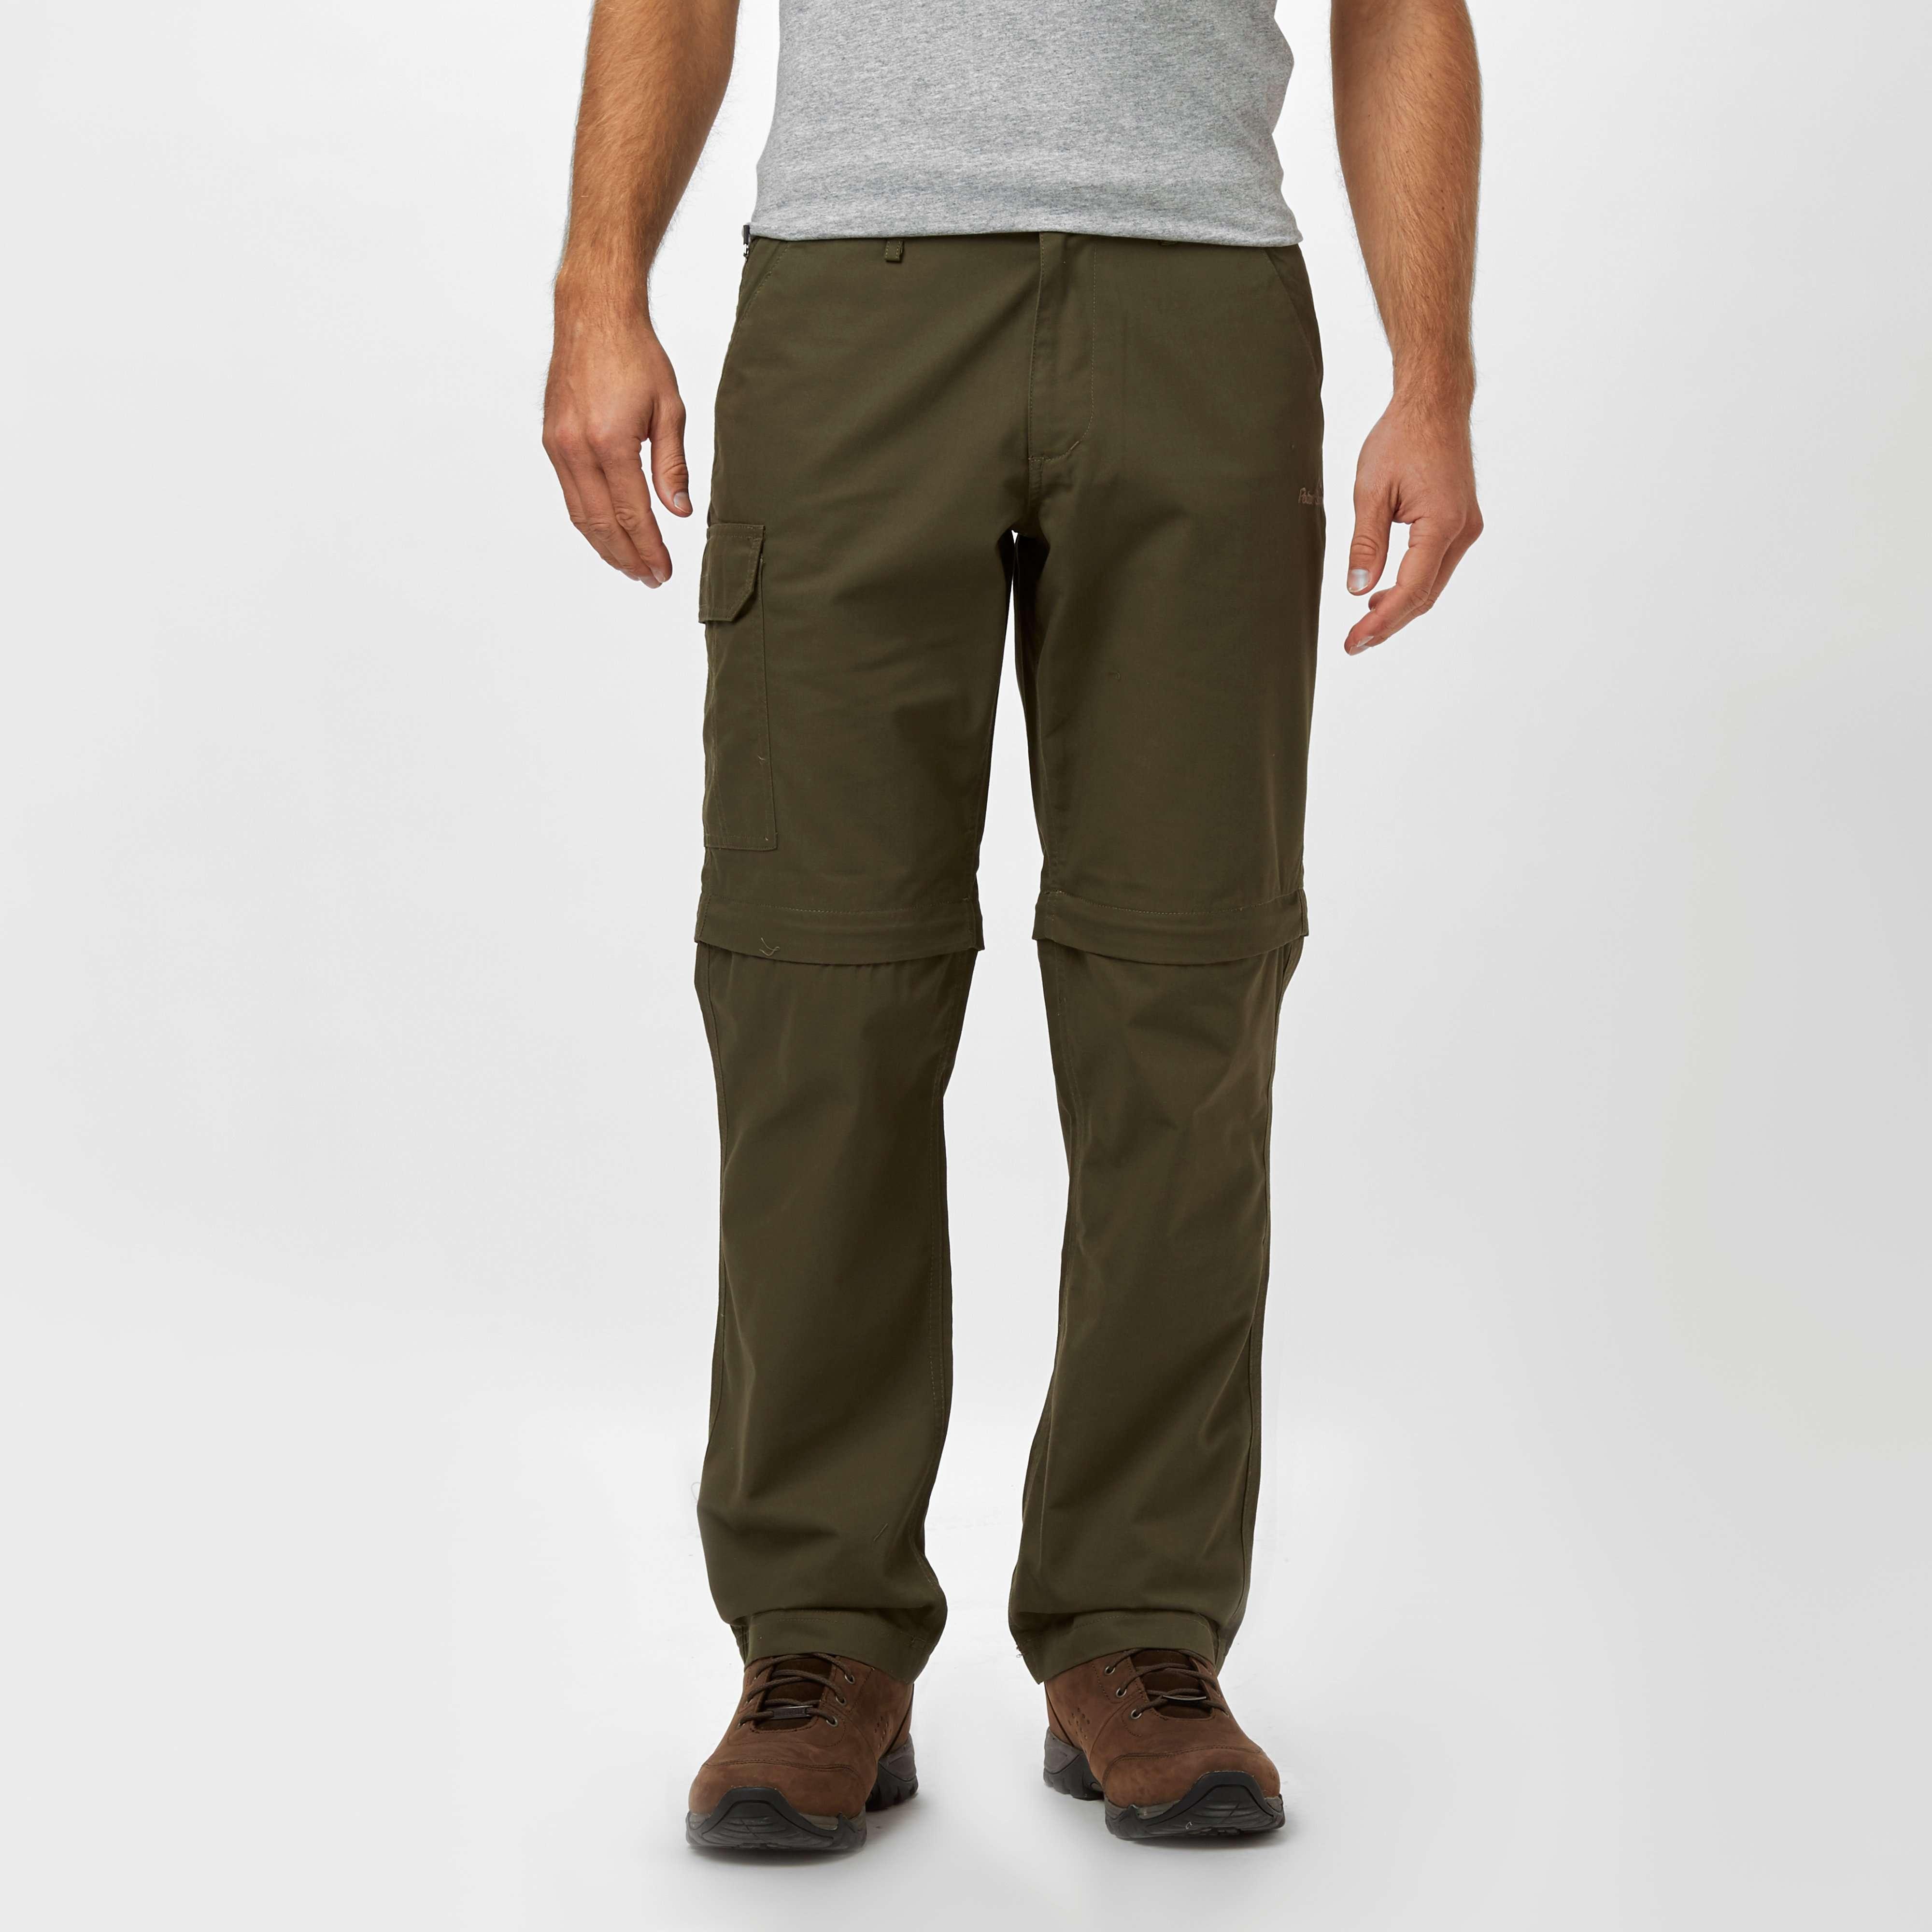 PETER STORM Men's Ramble Convertible Trousers